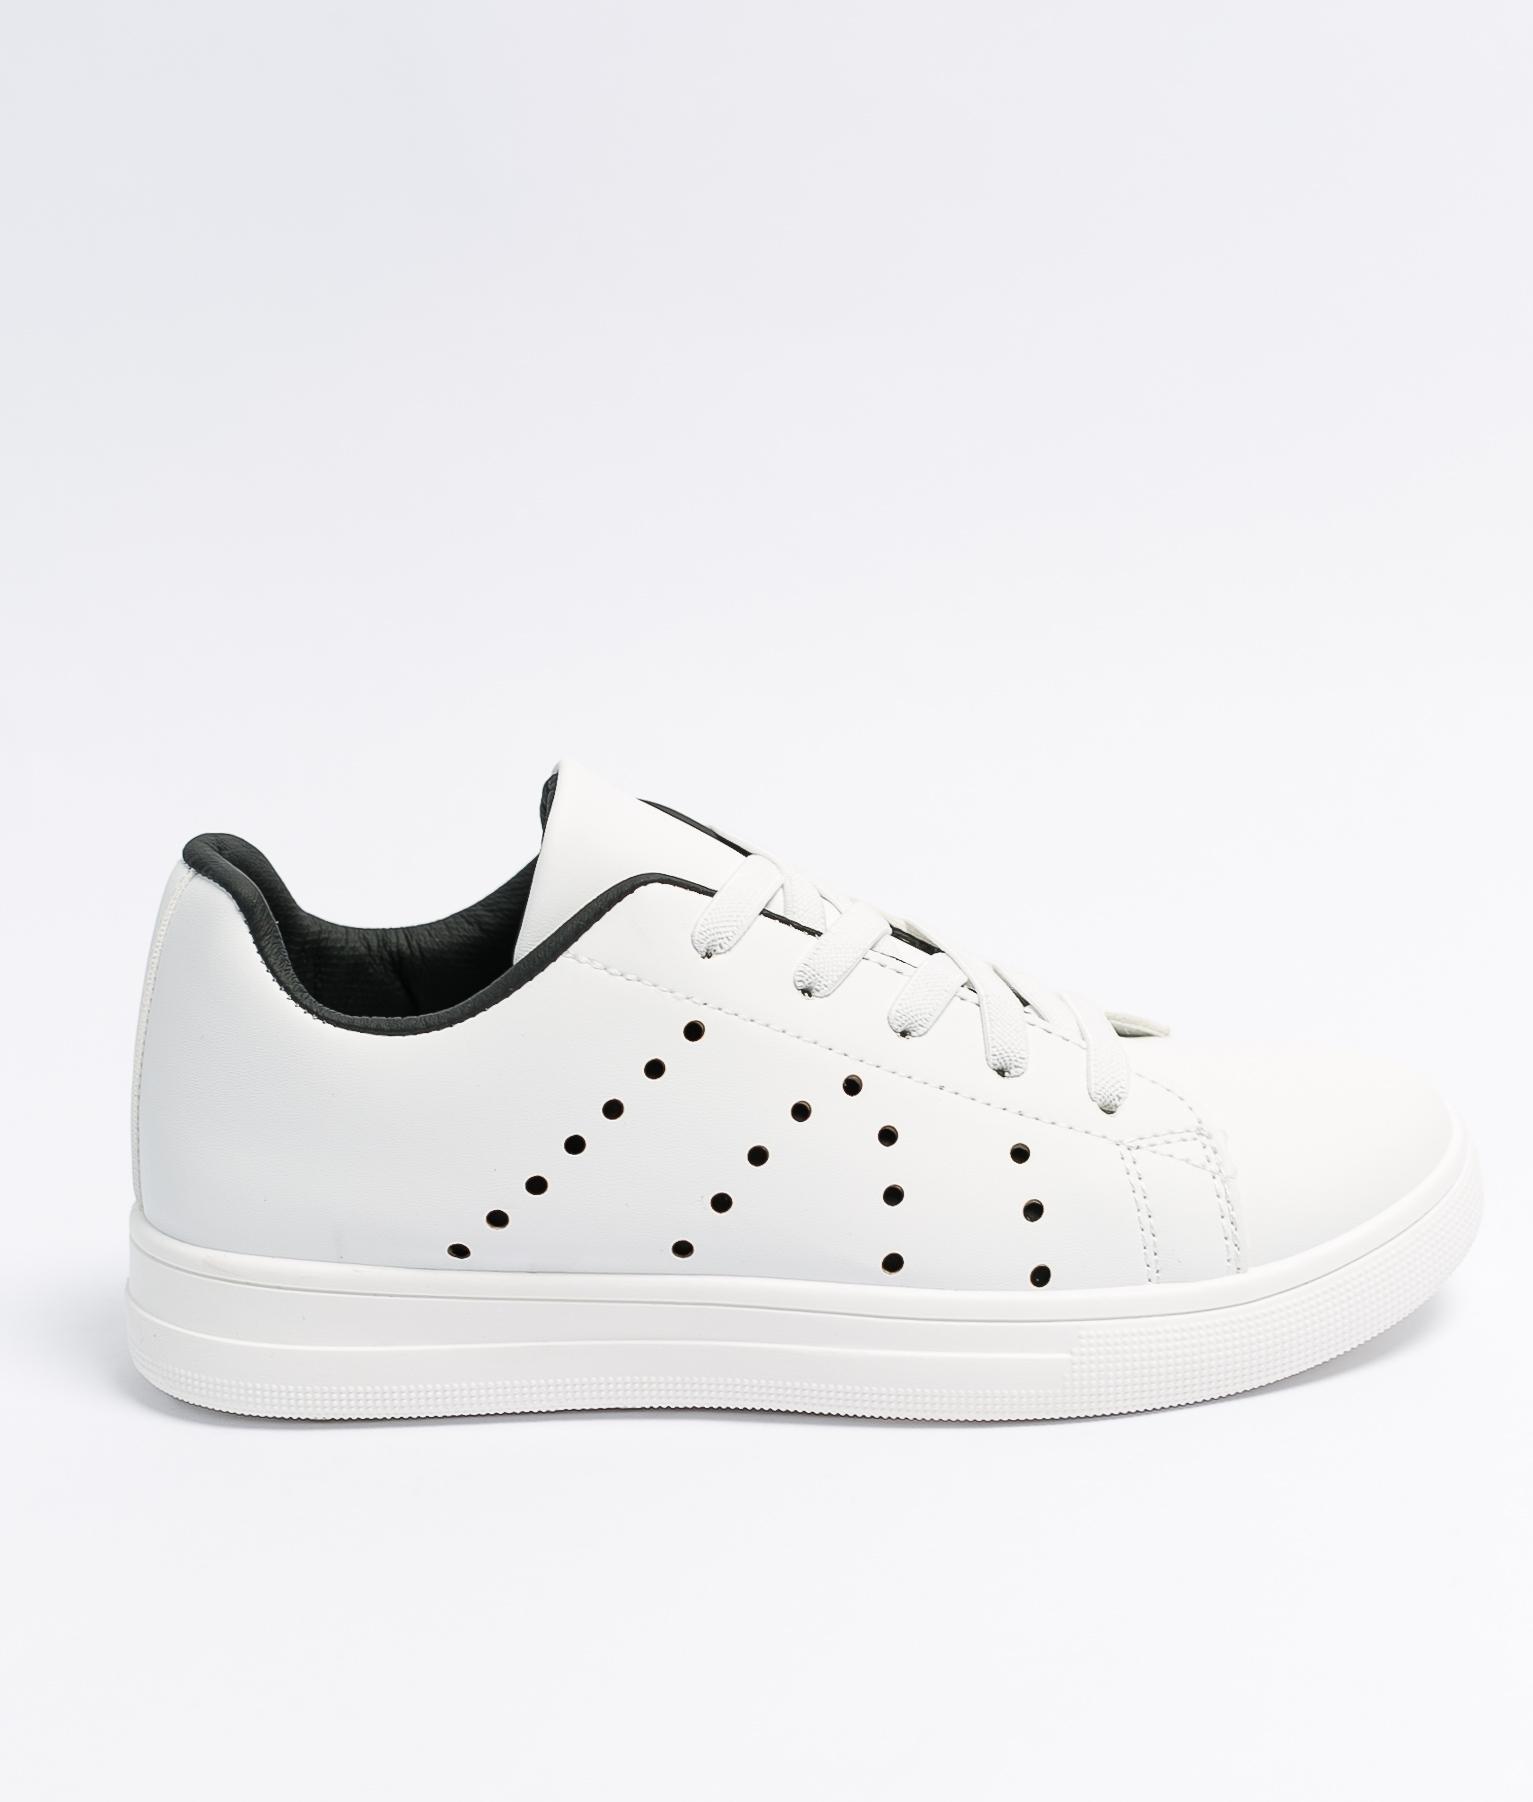 Sneakers Atelier - Noir